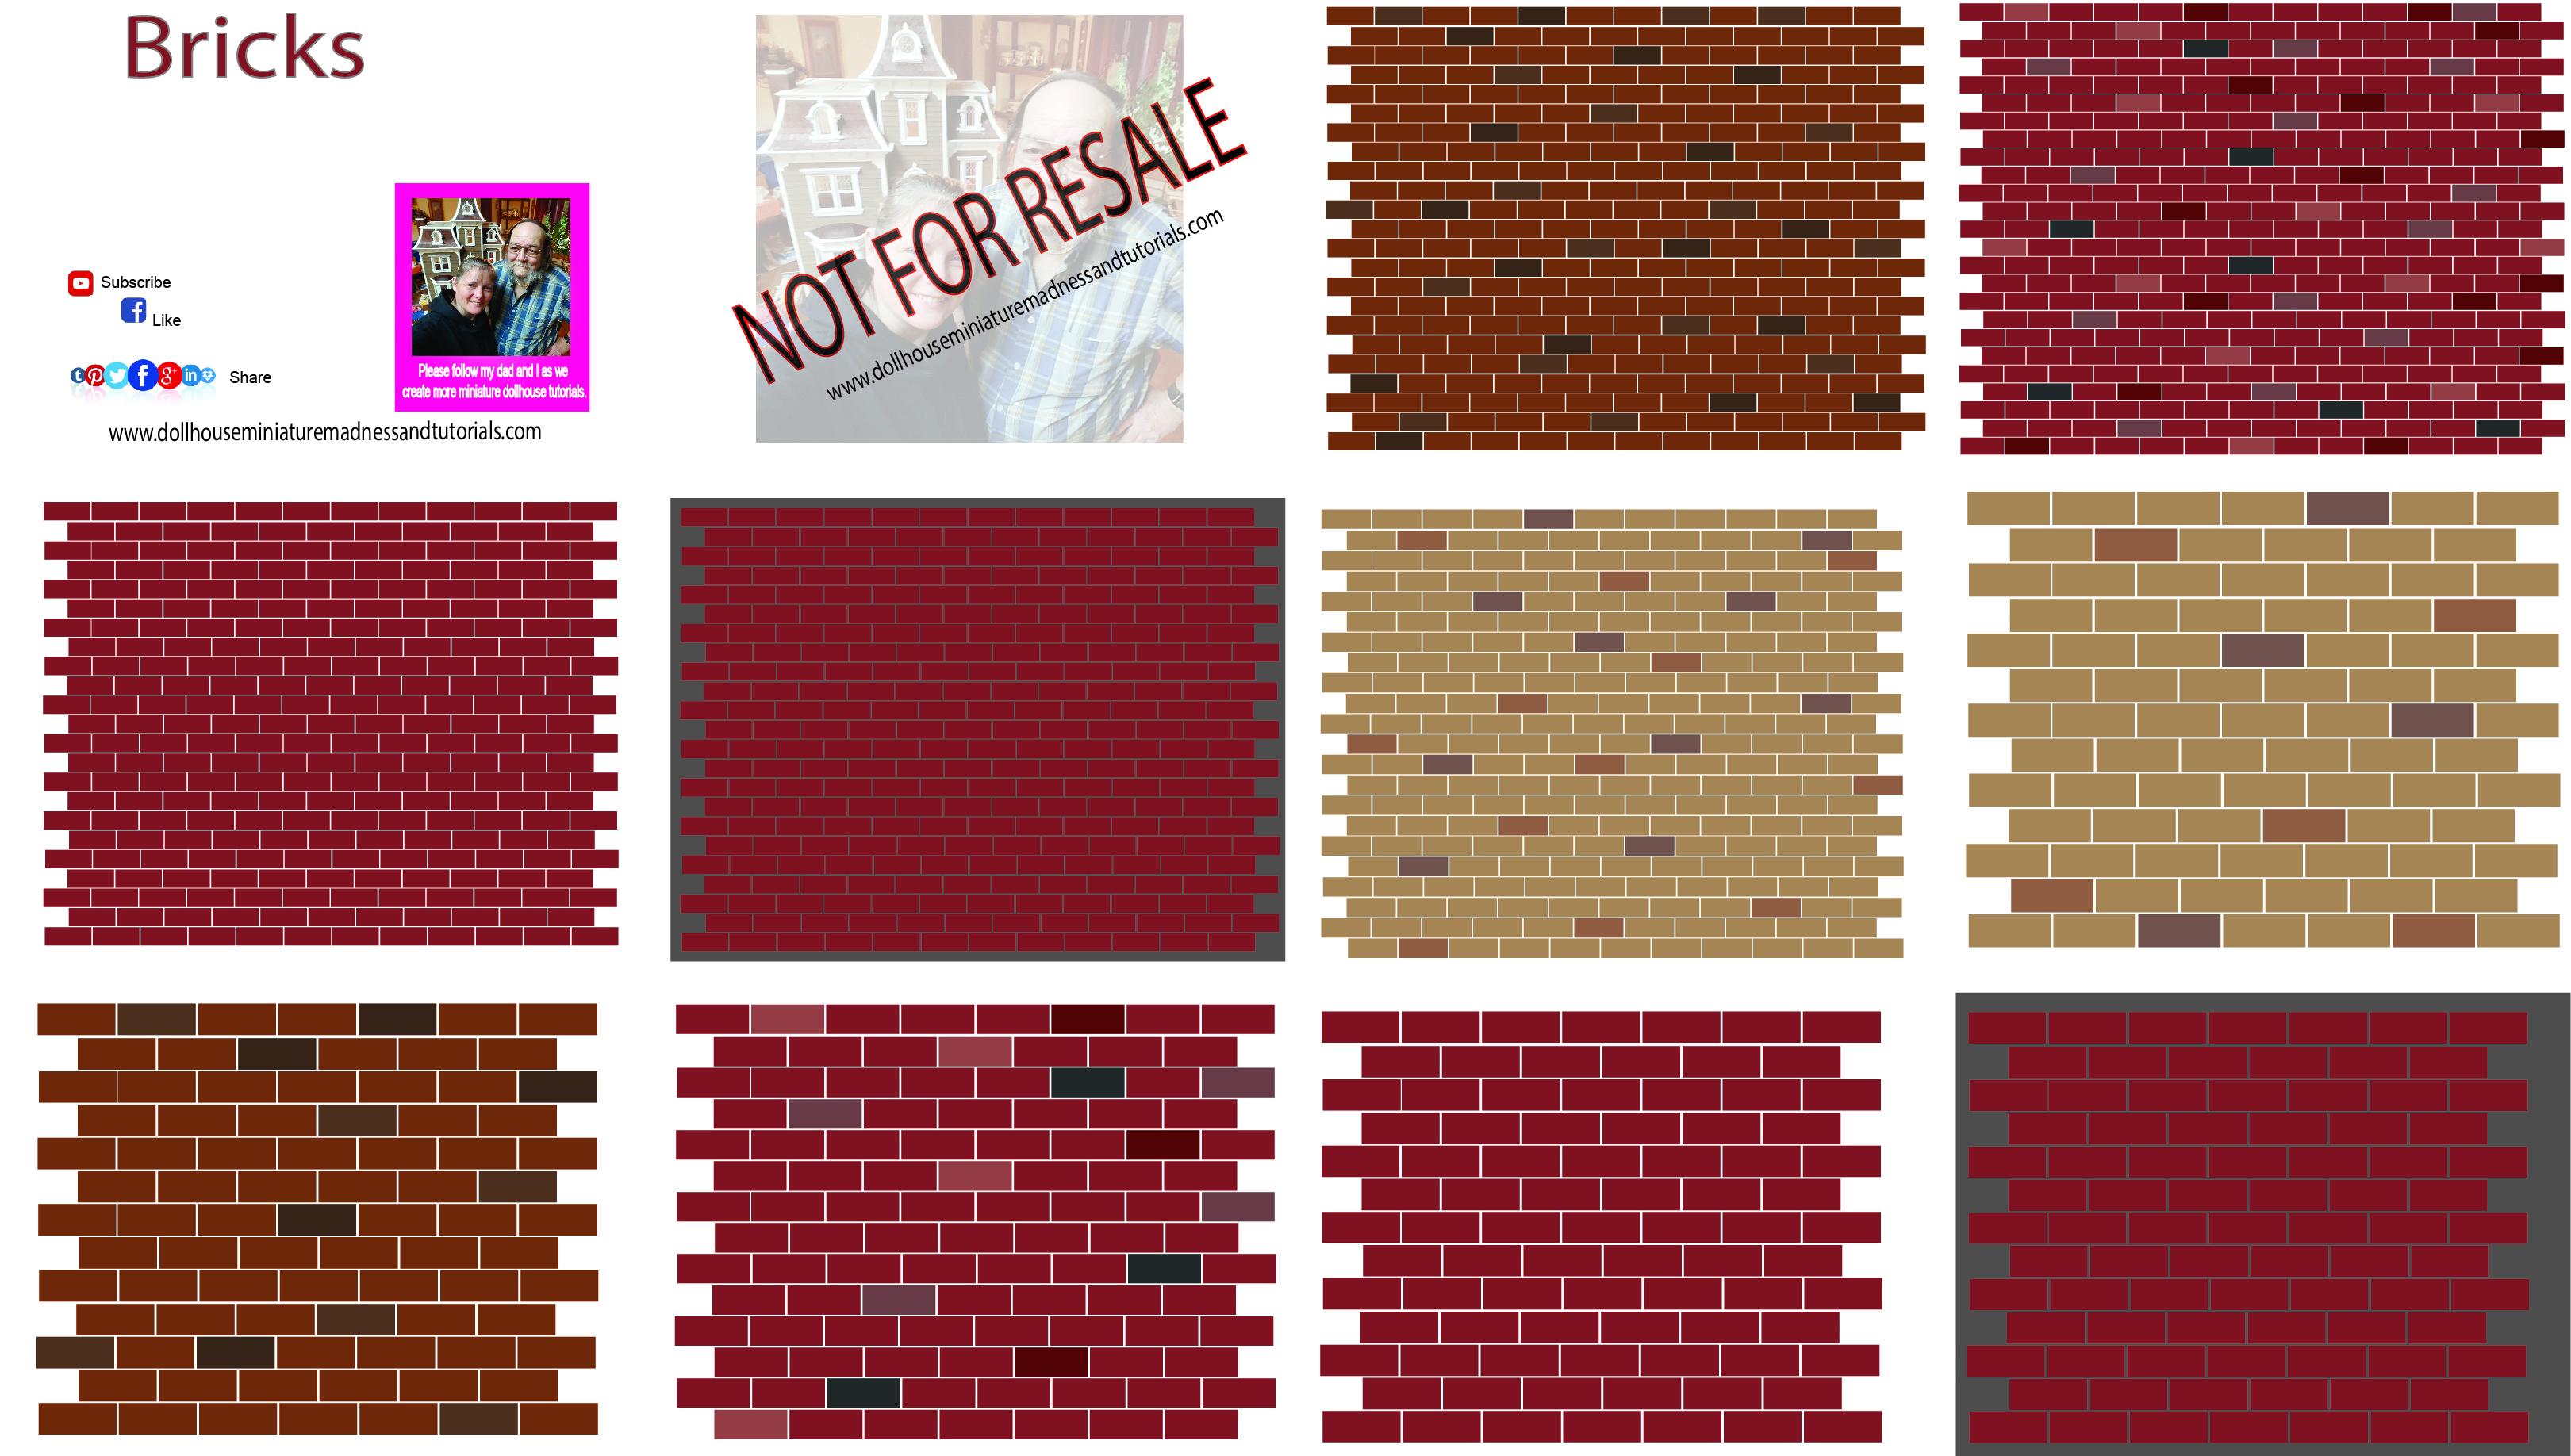 Bricks Amp Stones Dollhouse Miniature Madness And Tutorials